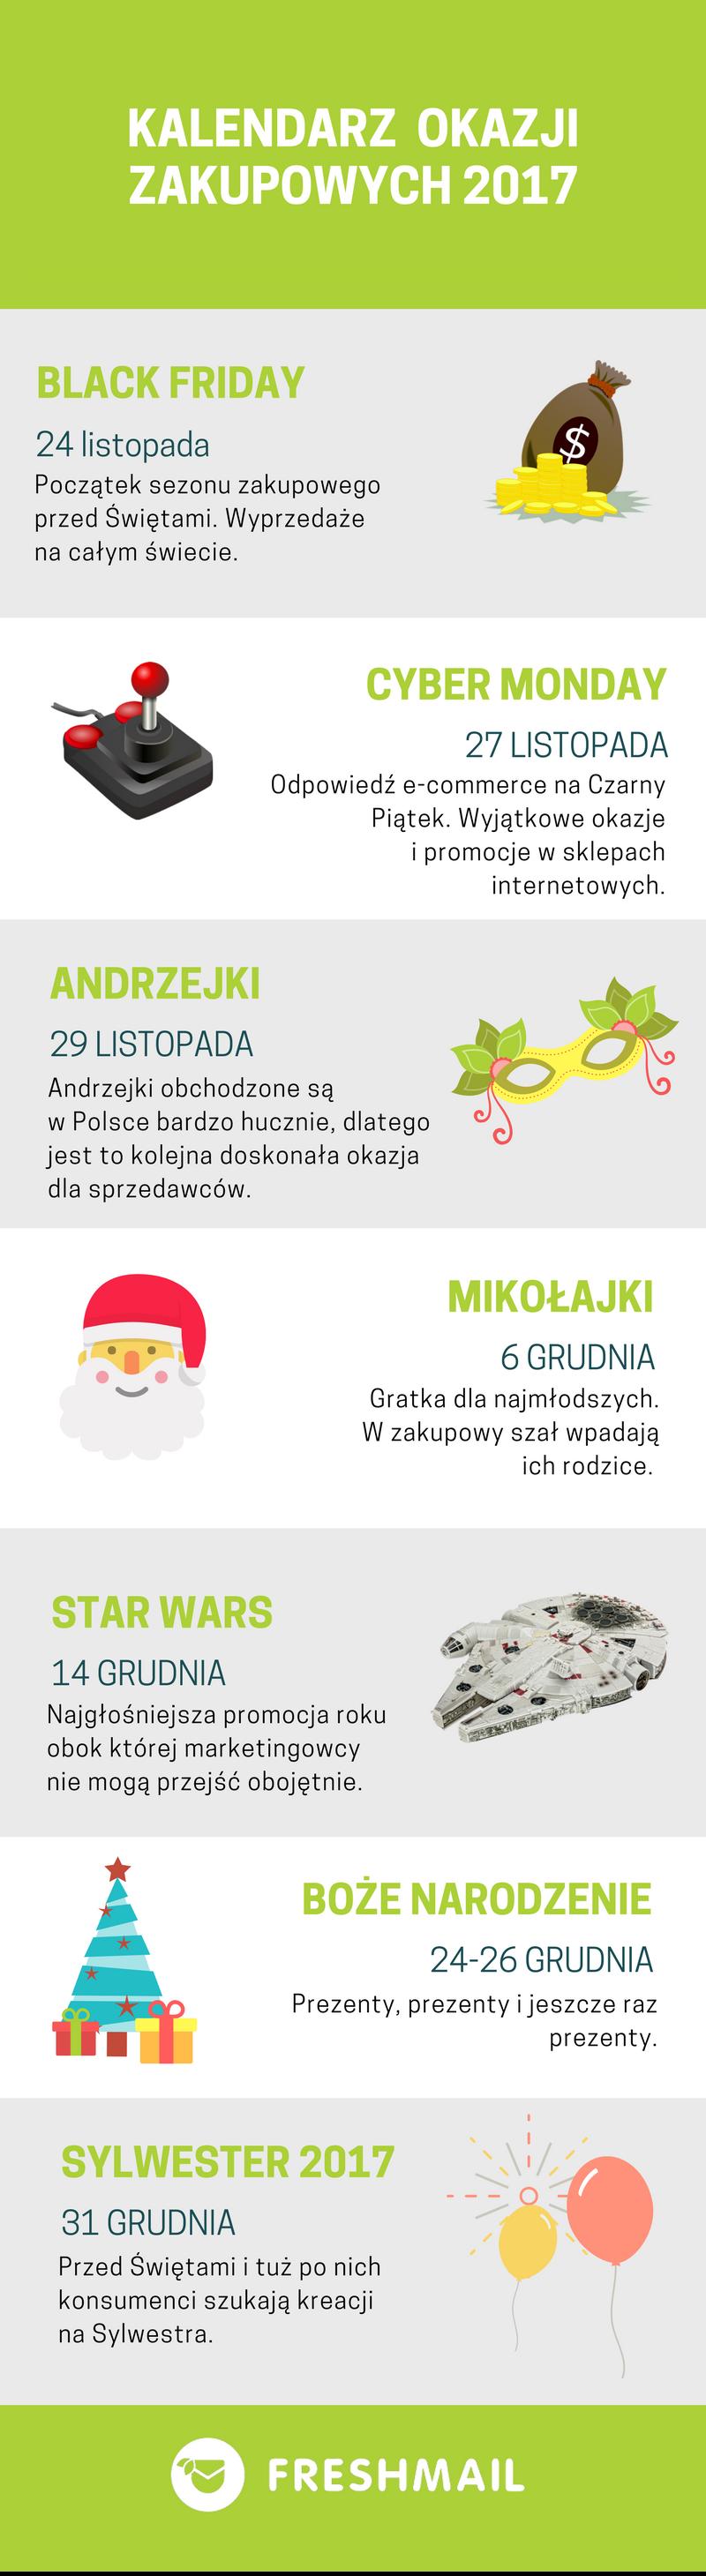 infografika świąteczna e-commerce